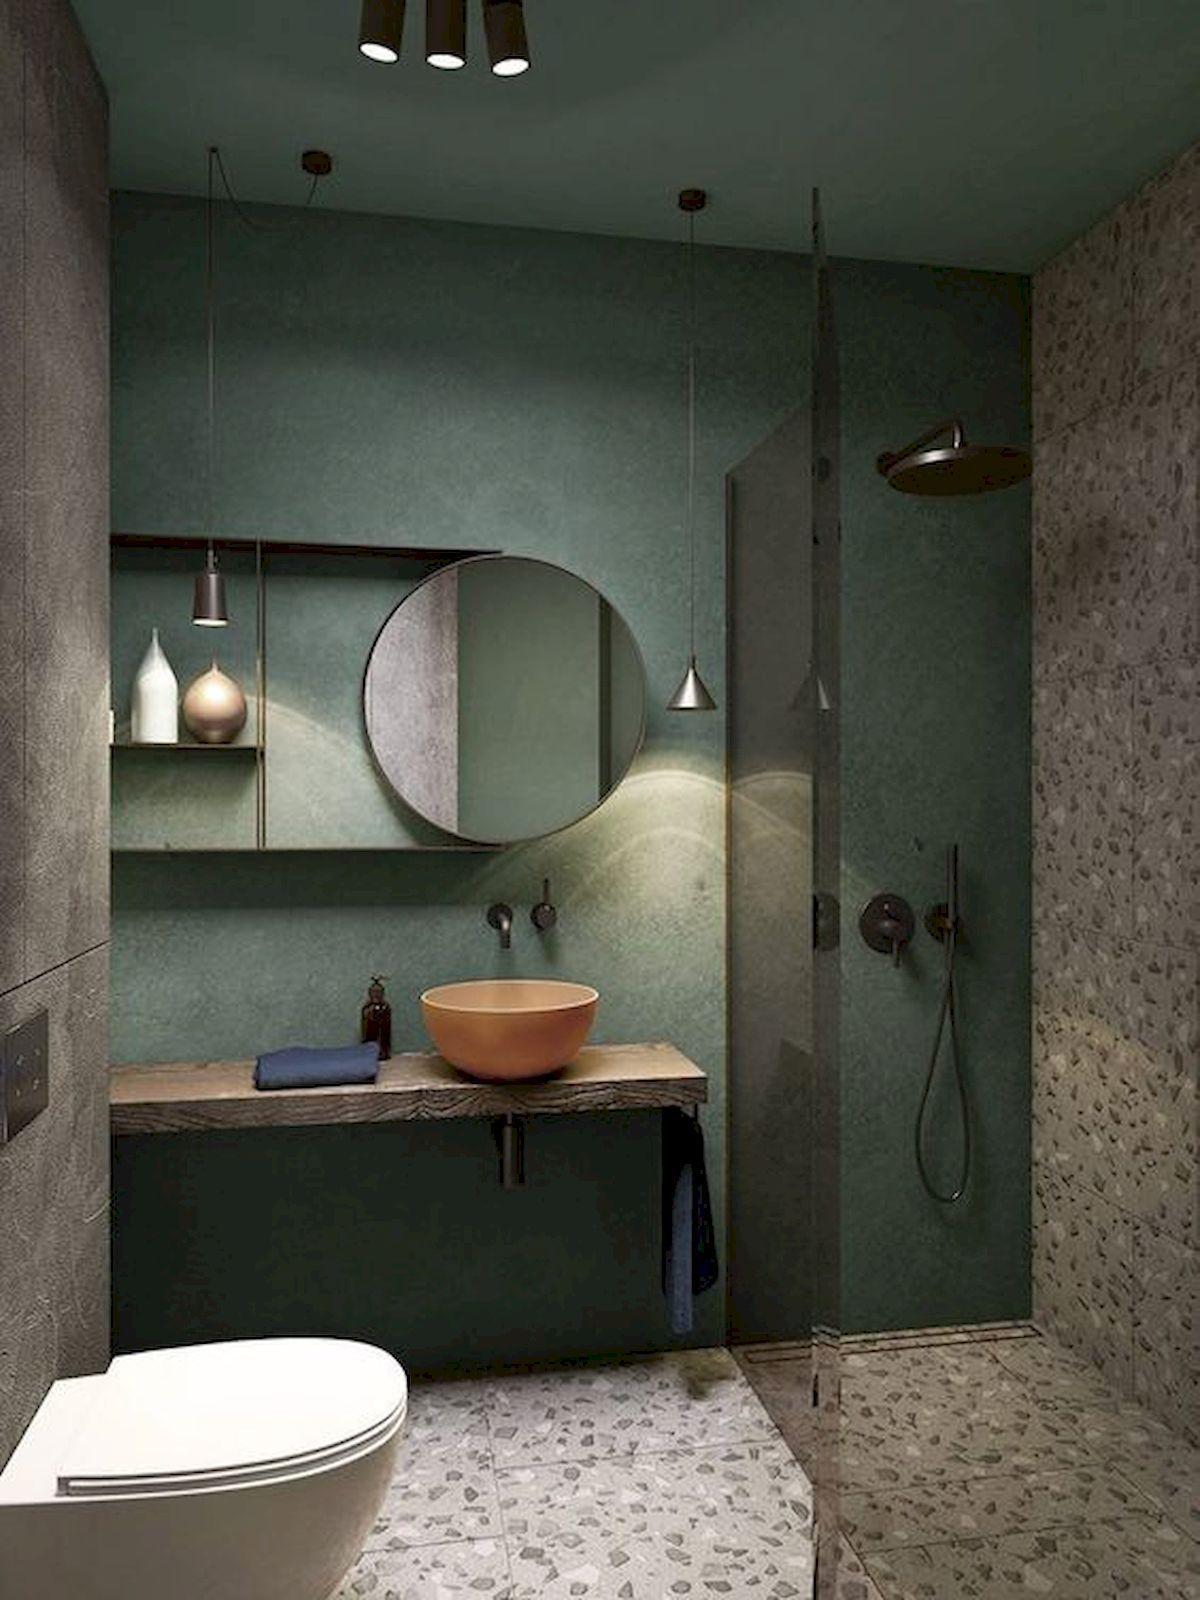 How To Design Bathroom Interiors With Personality With Images Natural Bathroom Bathroom Design Inspiration Bathroom Design Small